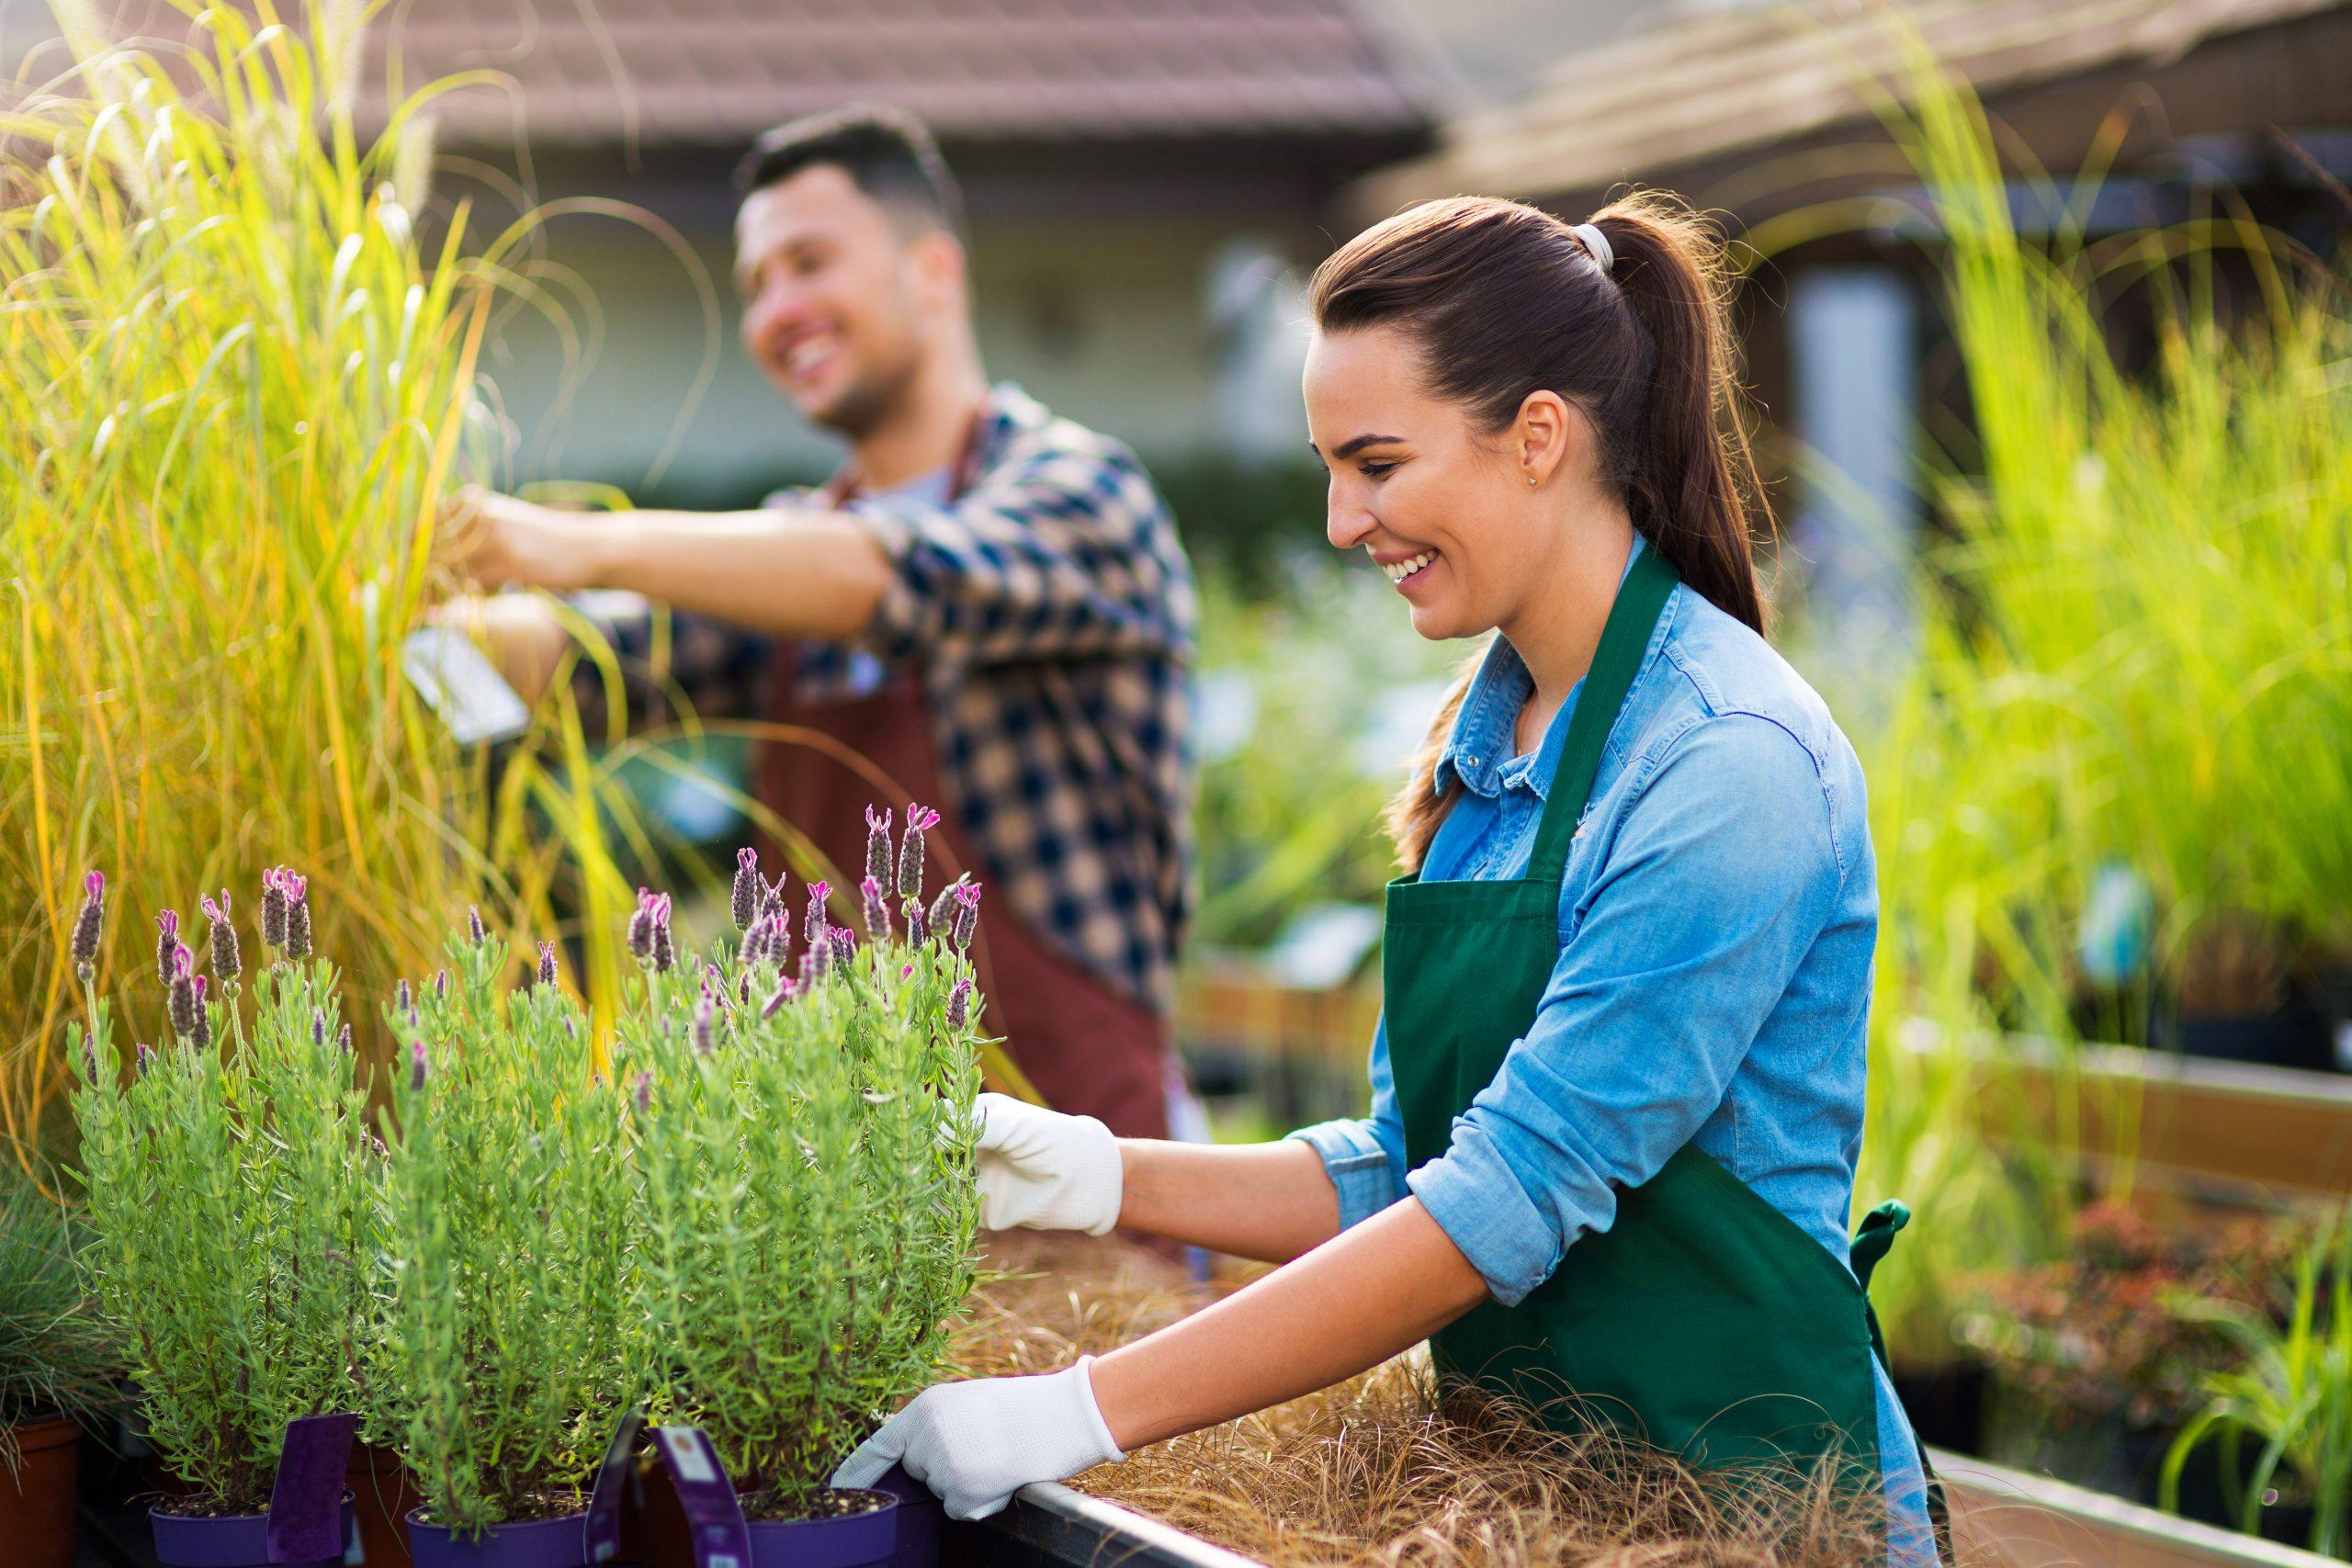 Postulez Pour Un Emploi - Cdjb avec Jardin Botanique Emploi